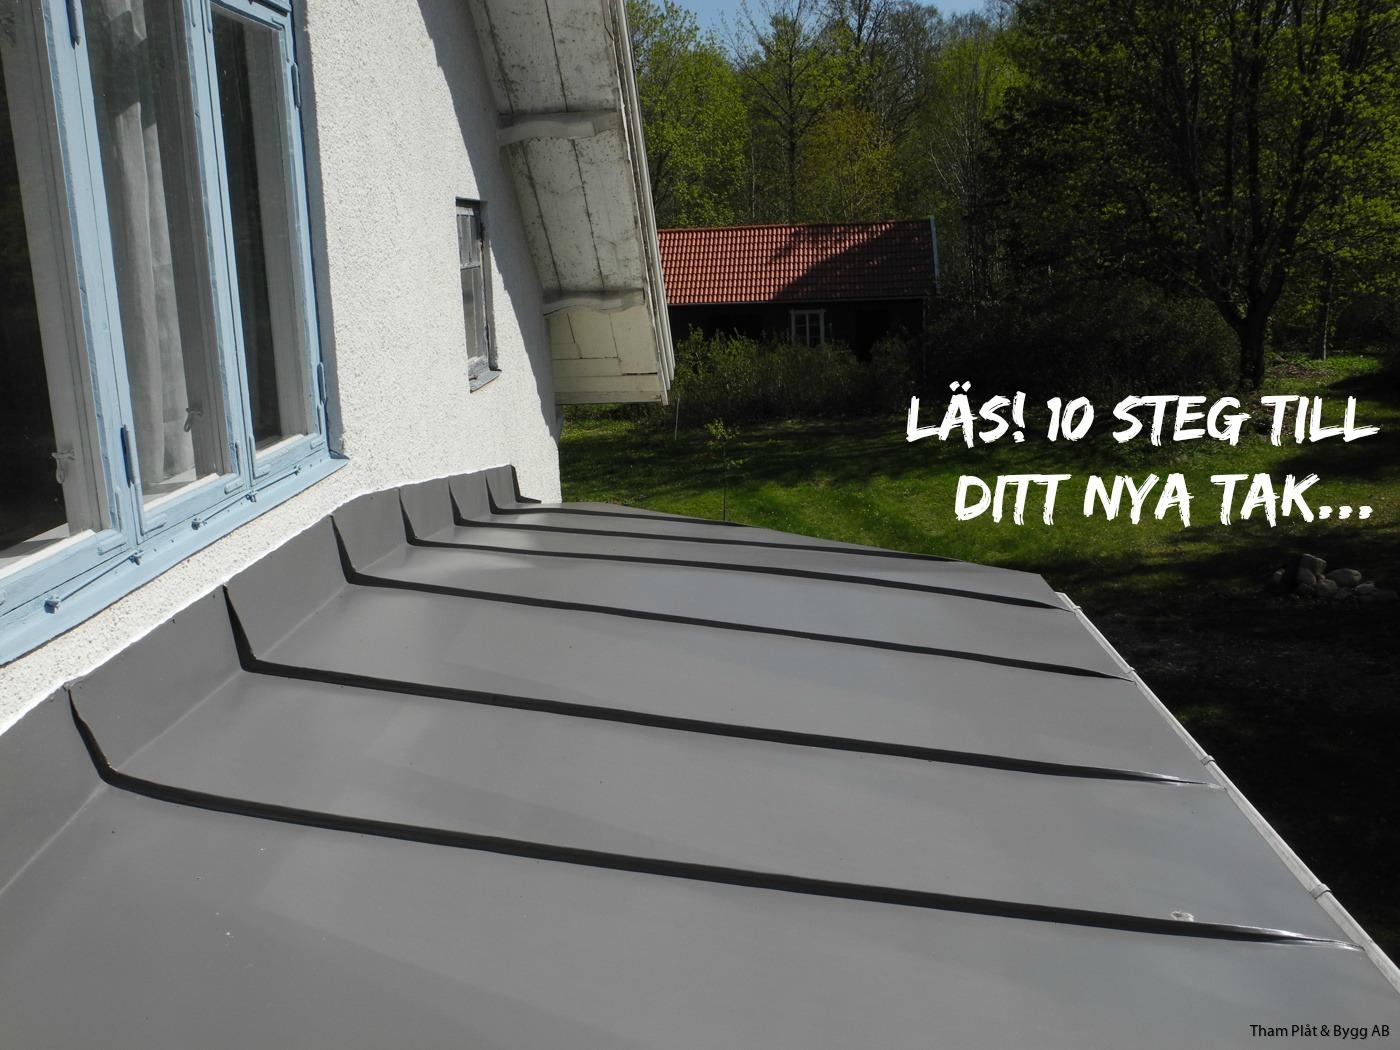 Renovera   lägga tak  c409337915bd3